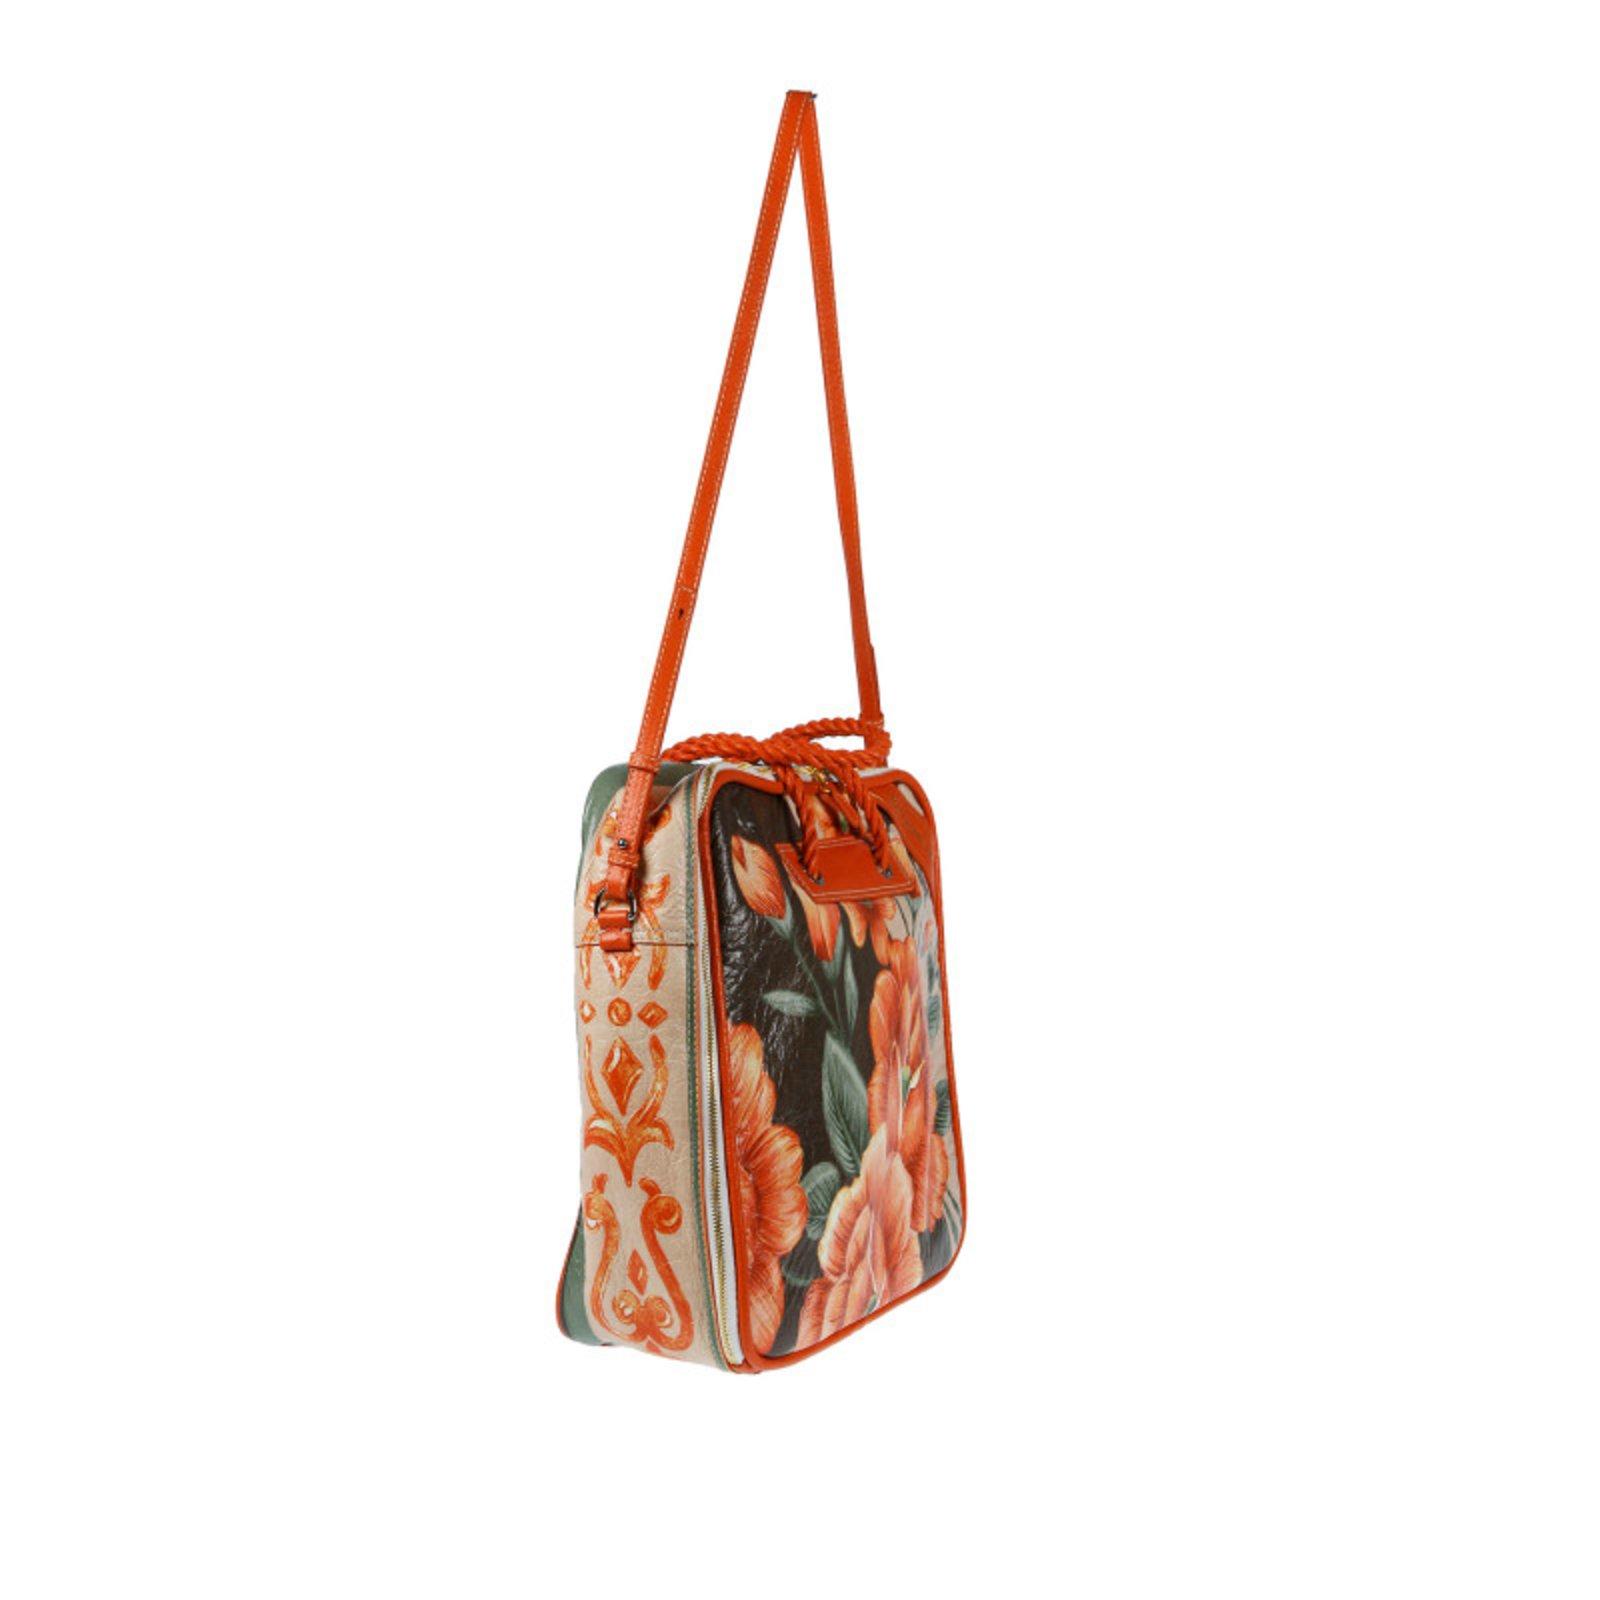 4f1760732f Balenciaga Balenciaga bag new Handbags Leather Multiple colors ref.72158 -  Joli Closet